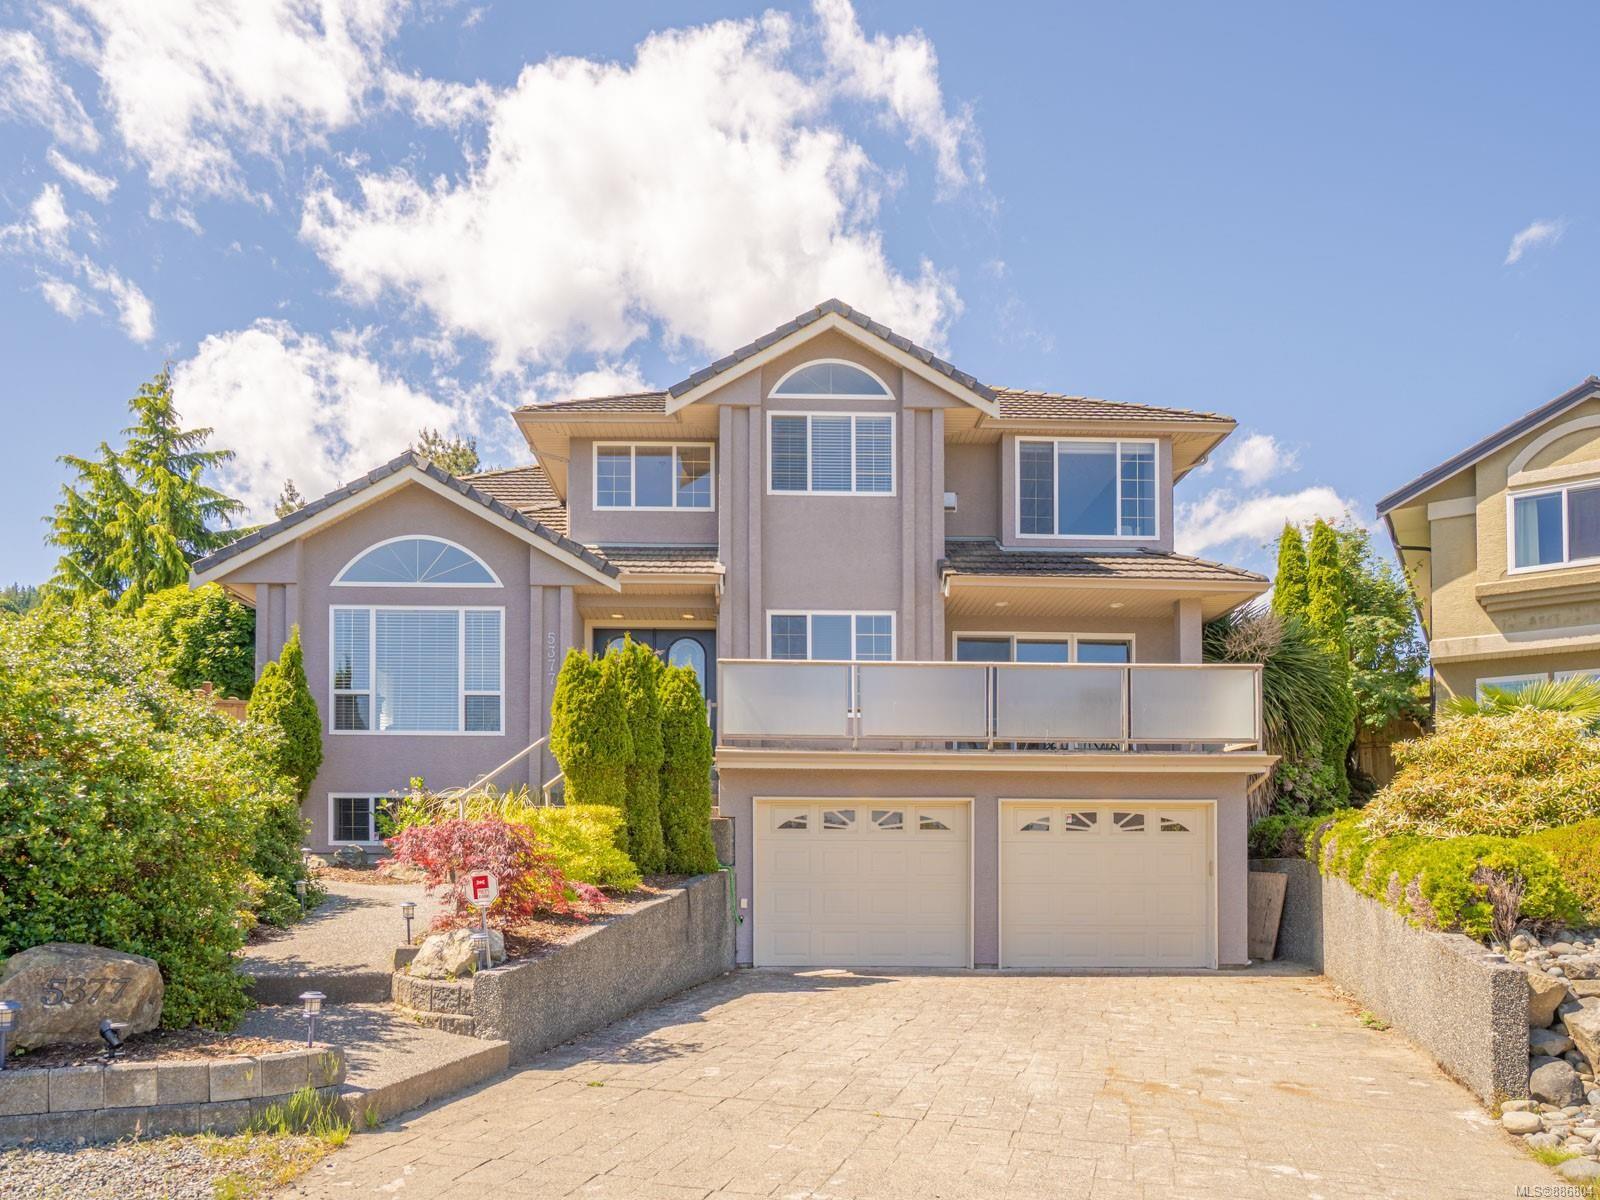 Main Photo: 5377 Fairhaven Pl in : Na North Nanaimo House for sale (Nanaimo)  : MLS®# 886804